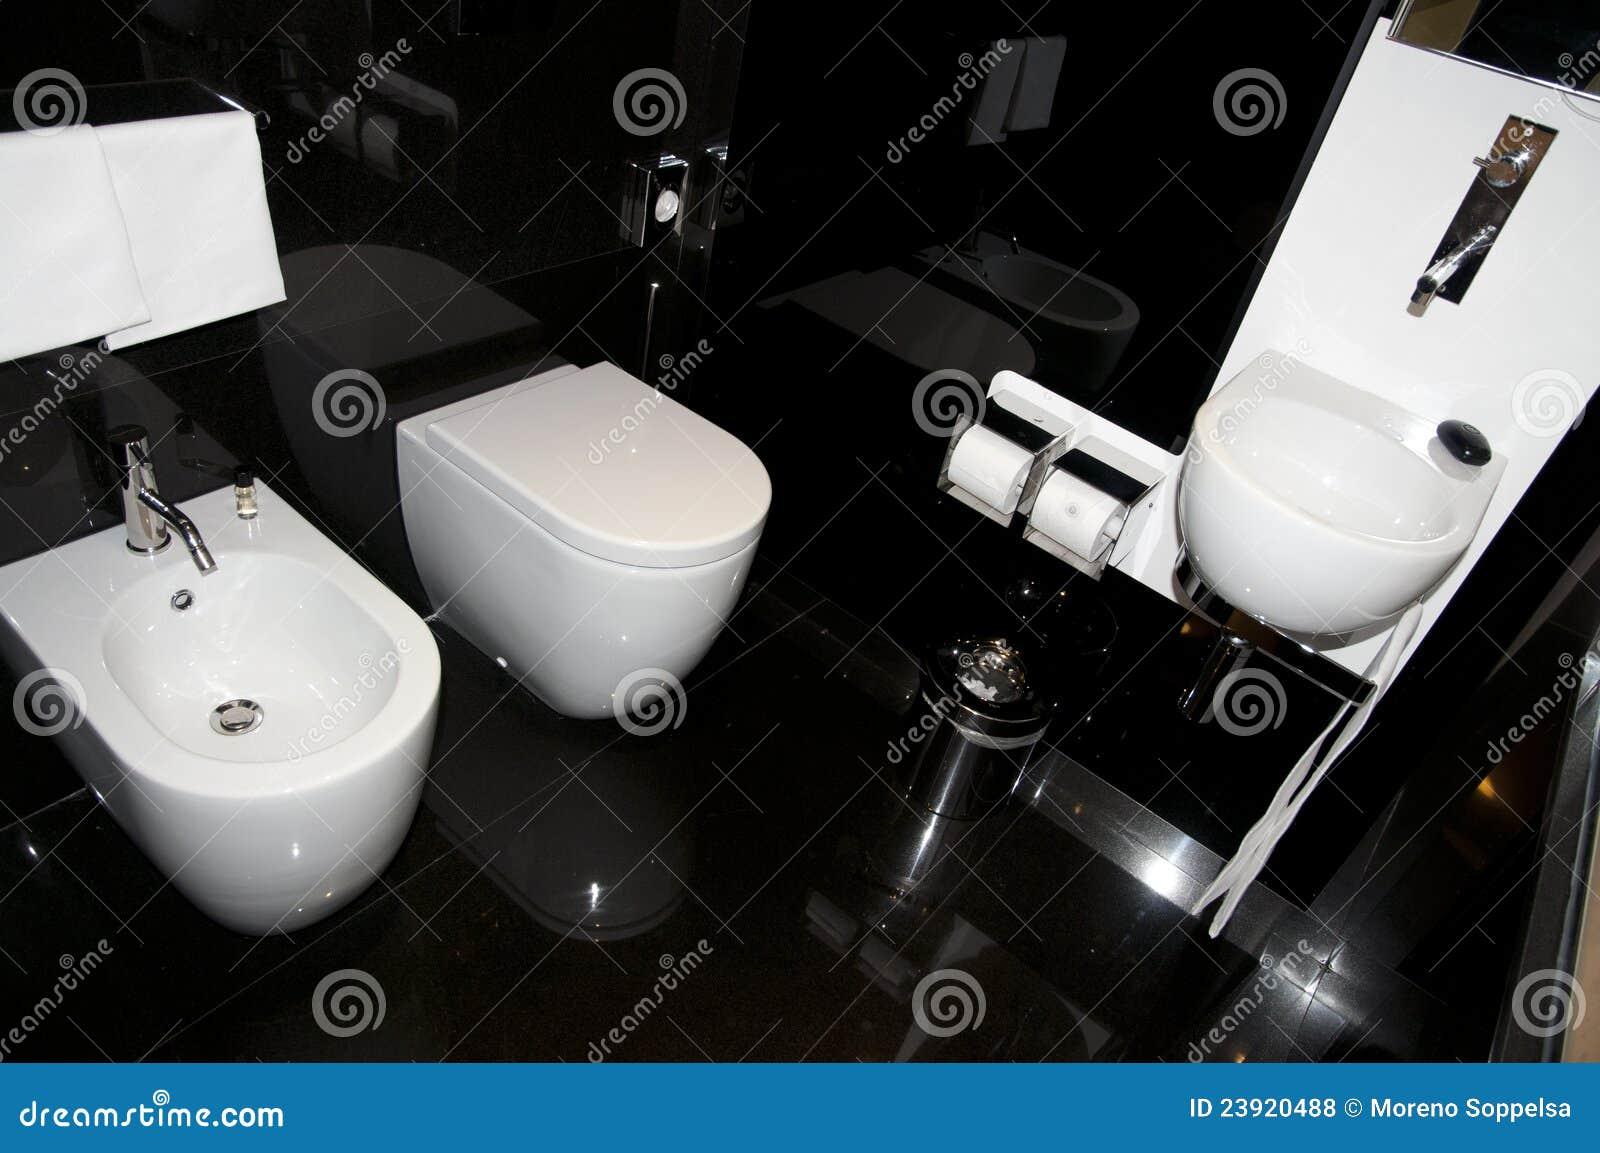 Luxury Toilet In Hotel Royalty Free Stock Photos Image